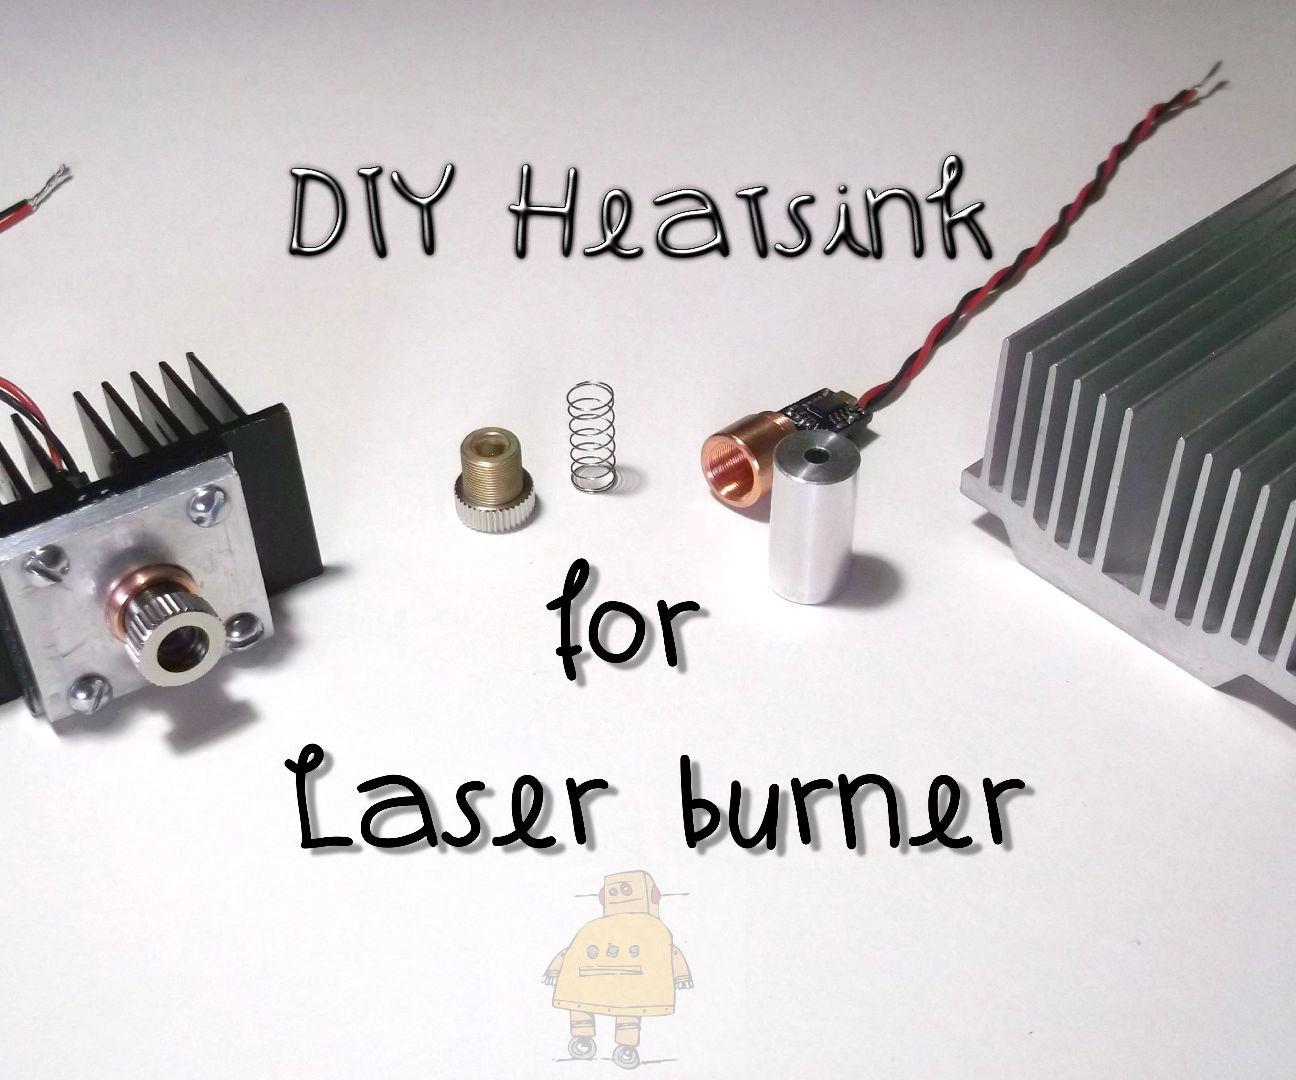 Heatsink for Diy laser engraver